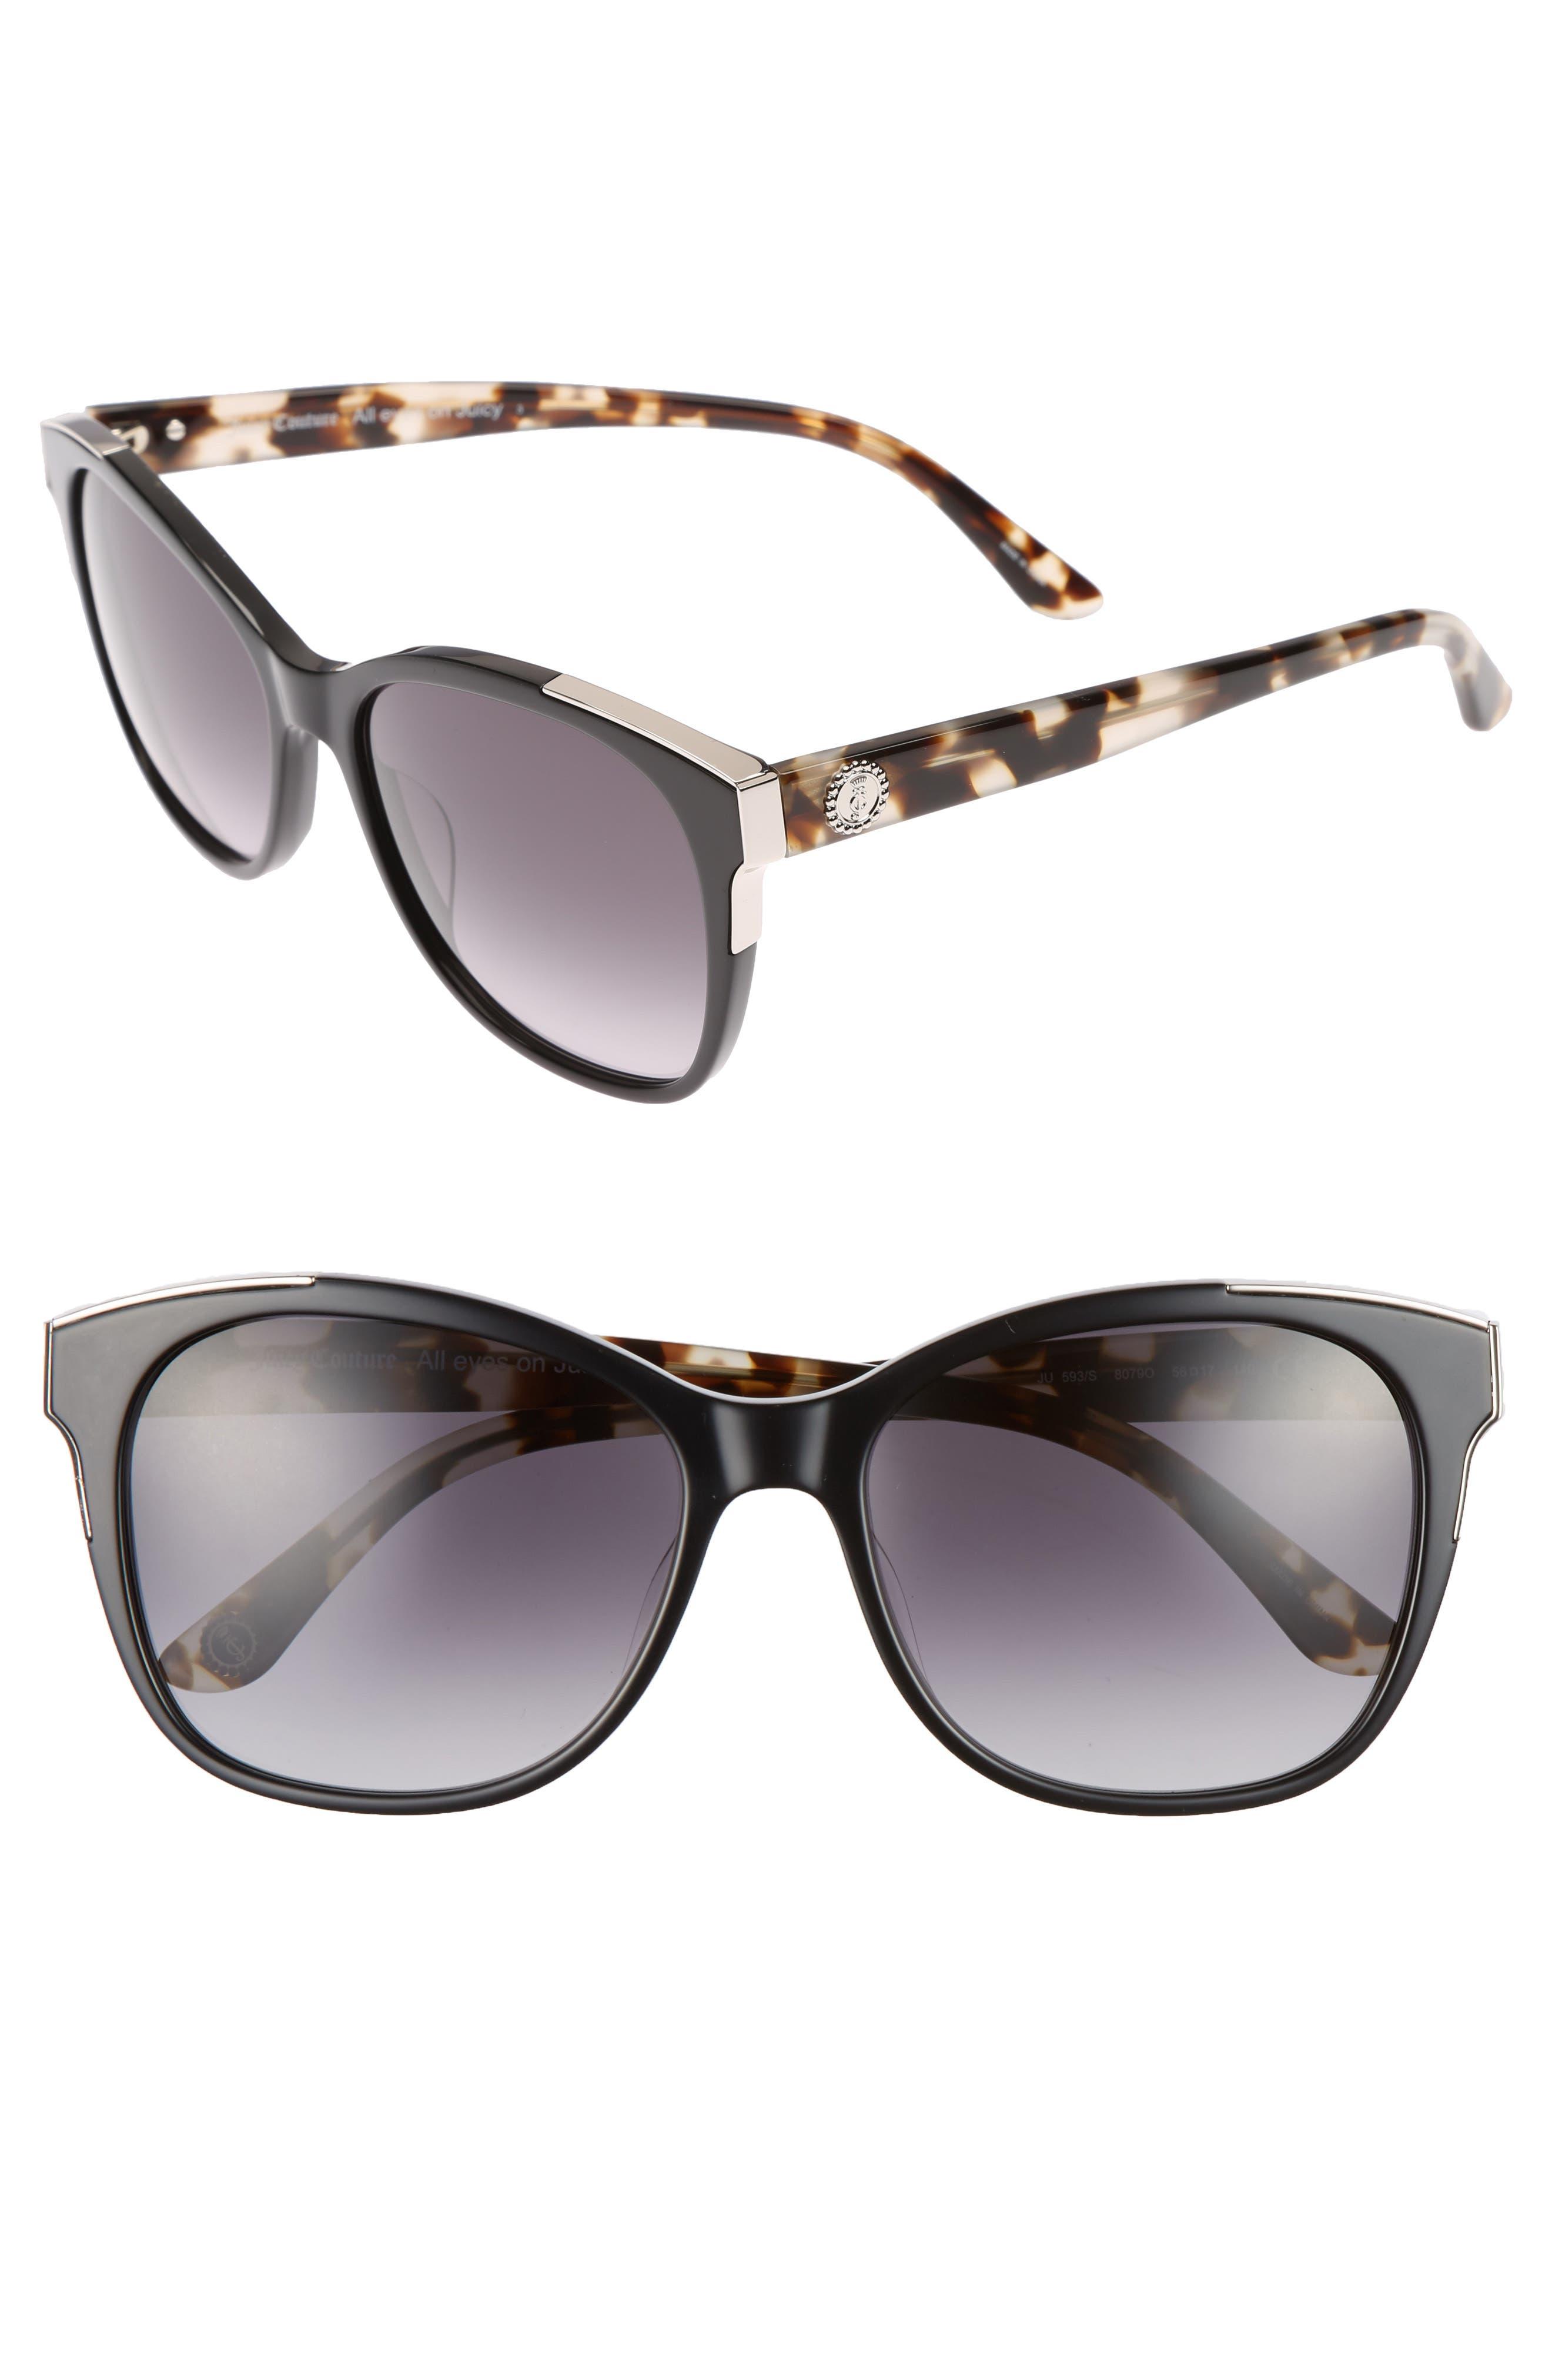 JUICY COUTURE, Black Label 56mm Cat Eye Sunglasses, Main thumbnail 1, color, 001